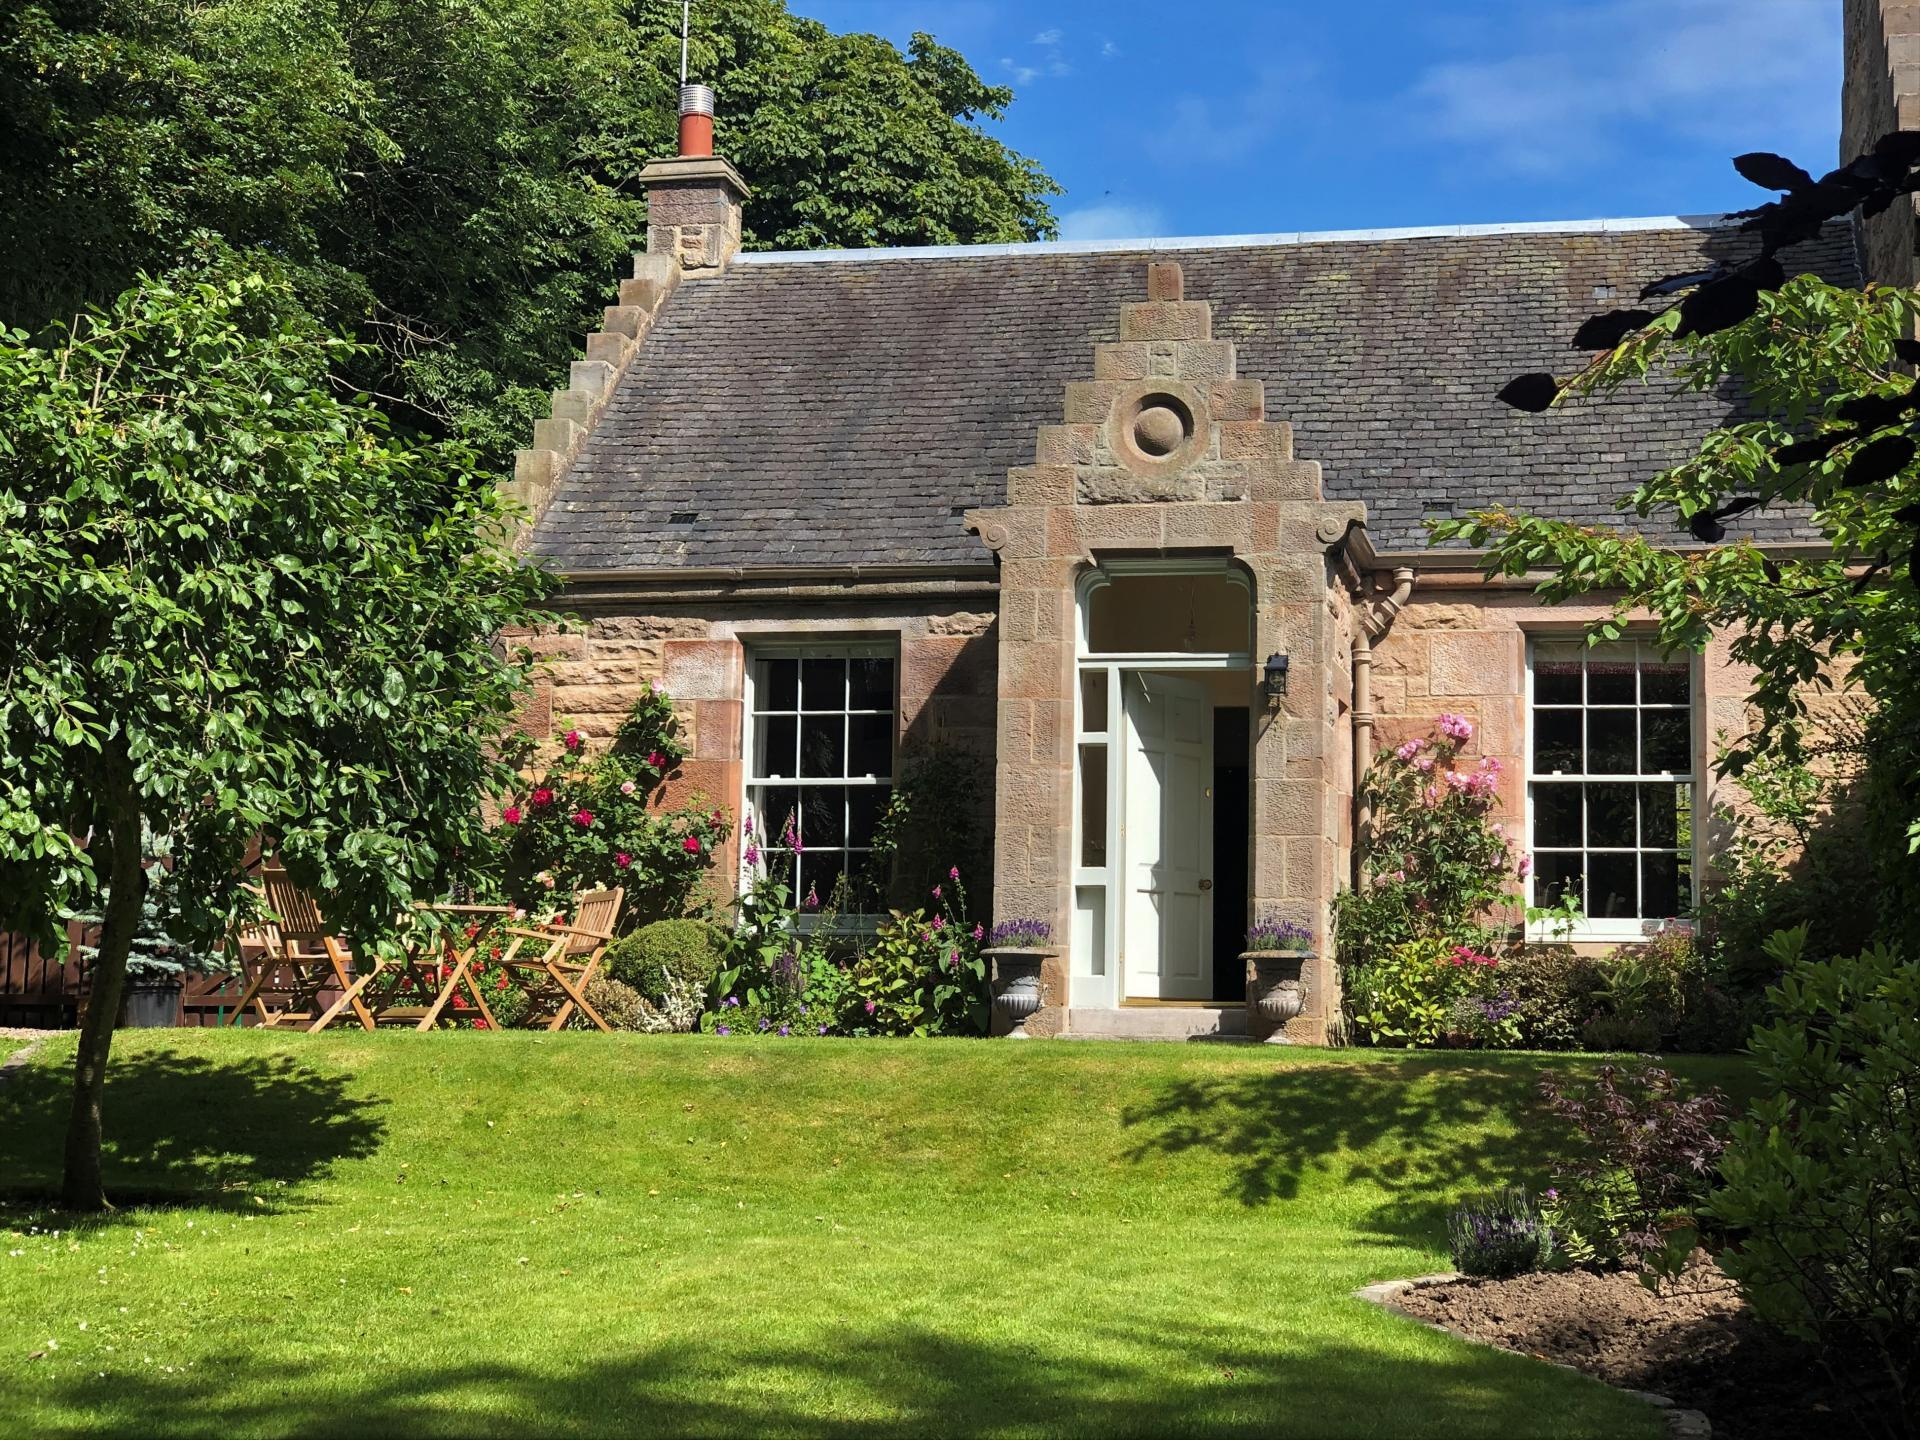 Glenlockhart Cottage, Edinburgh's secret